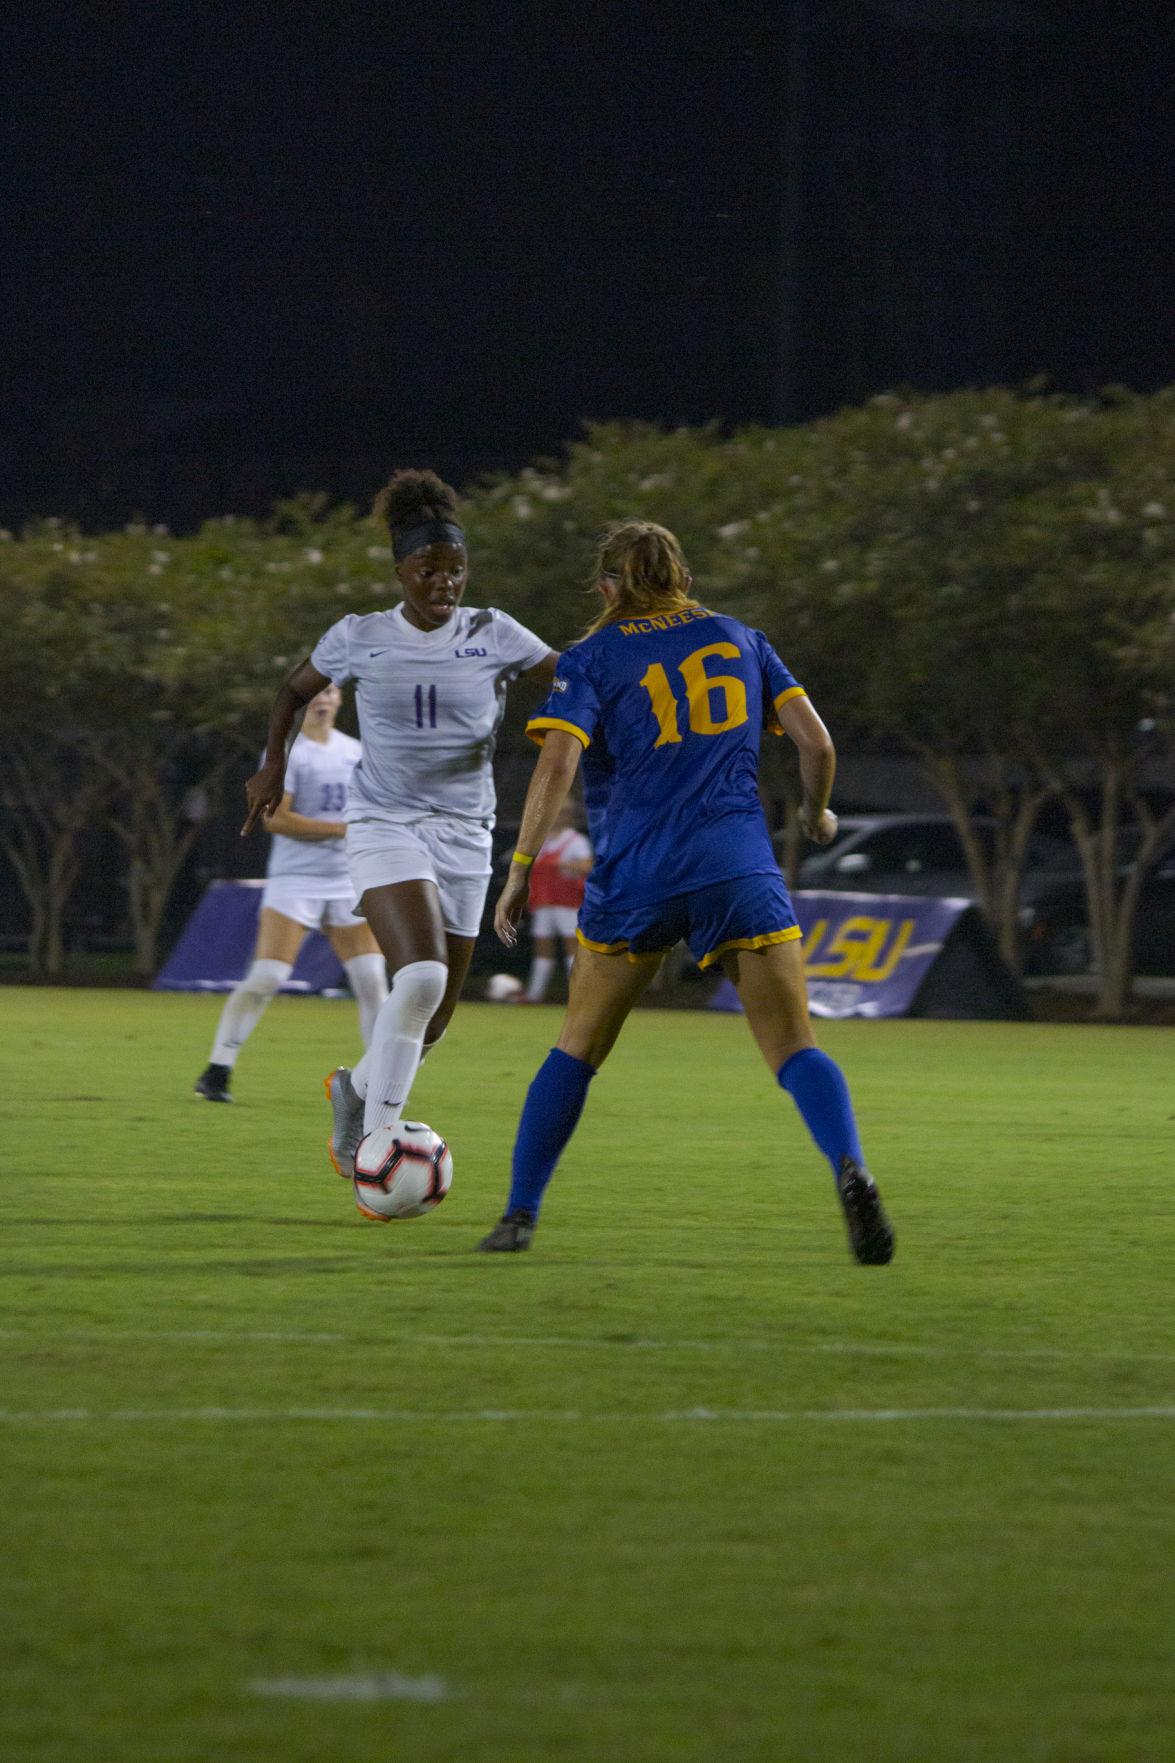 LSU vs. McNeese Womens' Soccer